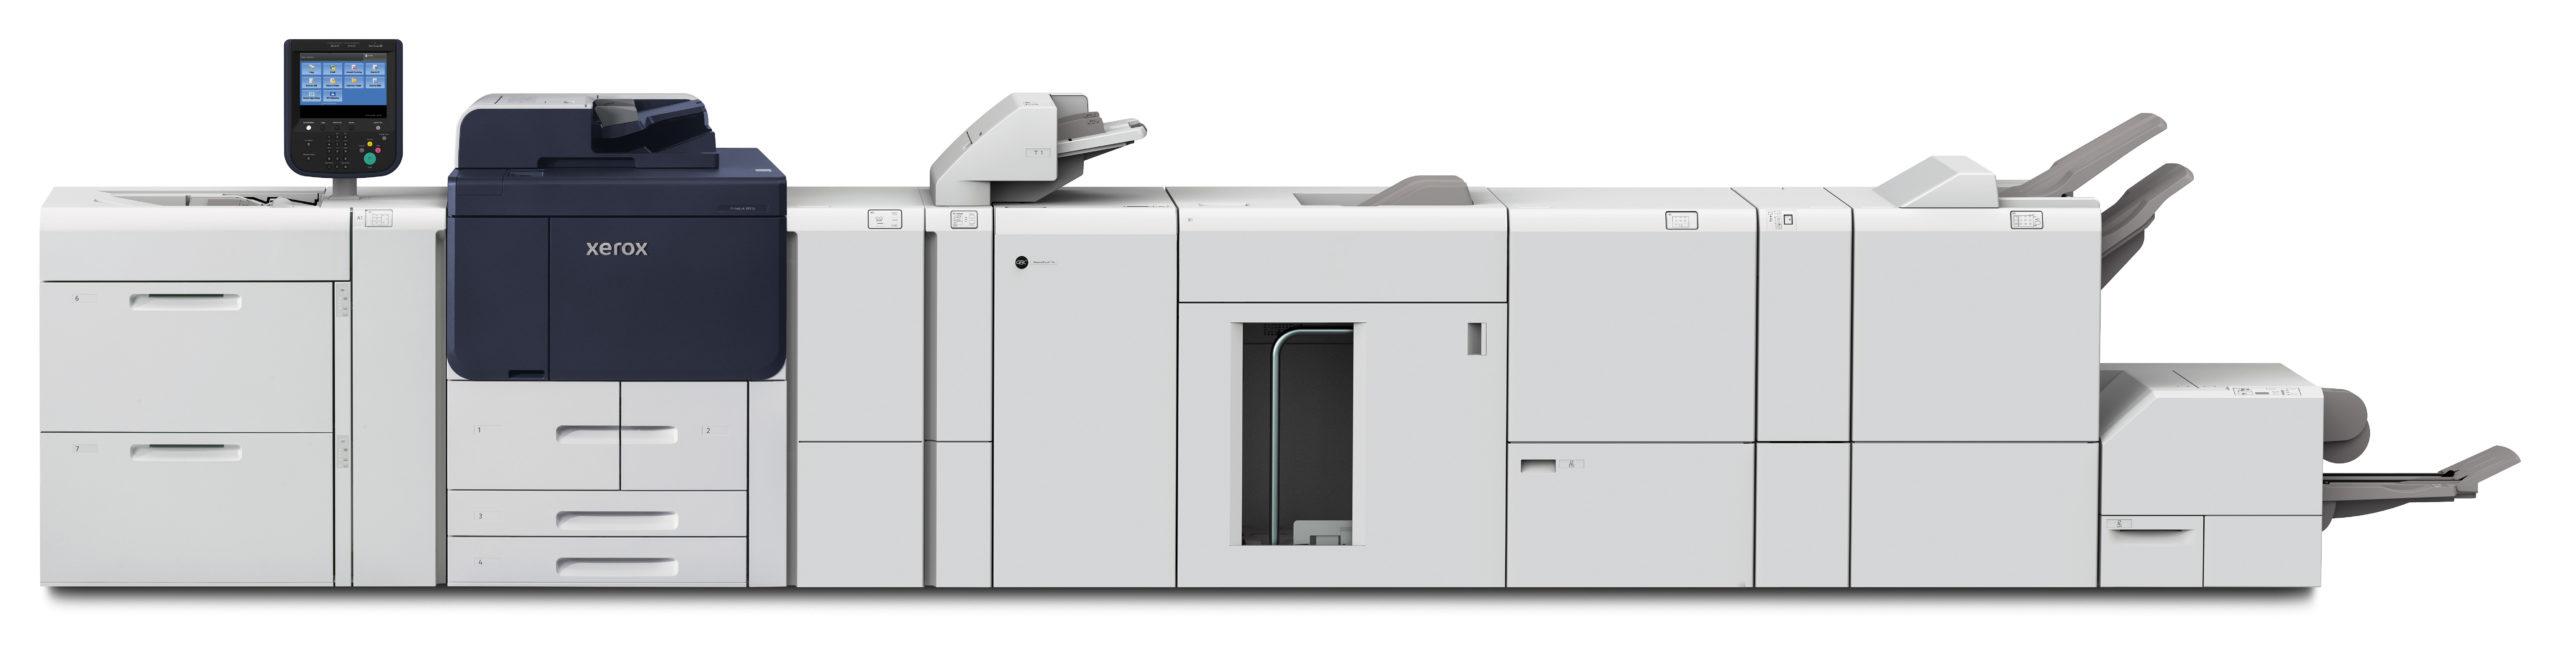 Xerox(r) PrimeLink(r) B9100/B9110/B9125/B9136 Copier/Printer